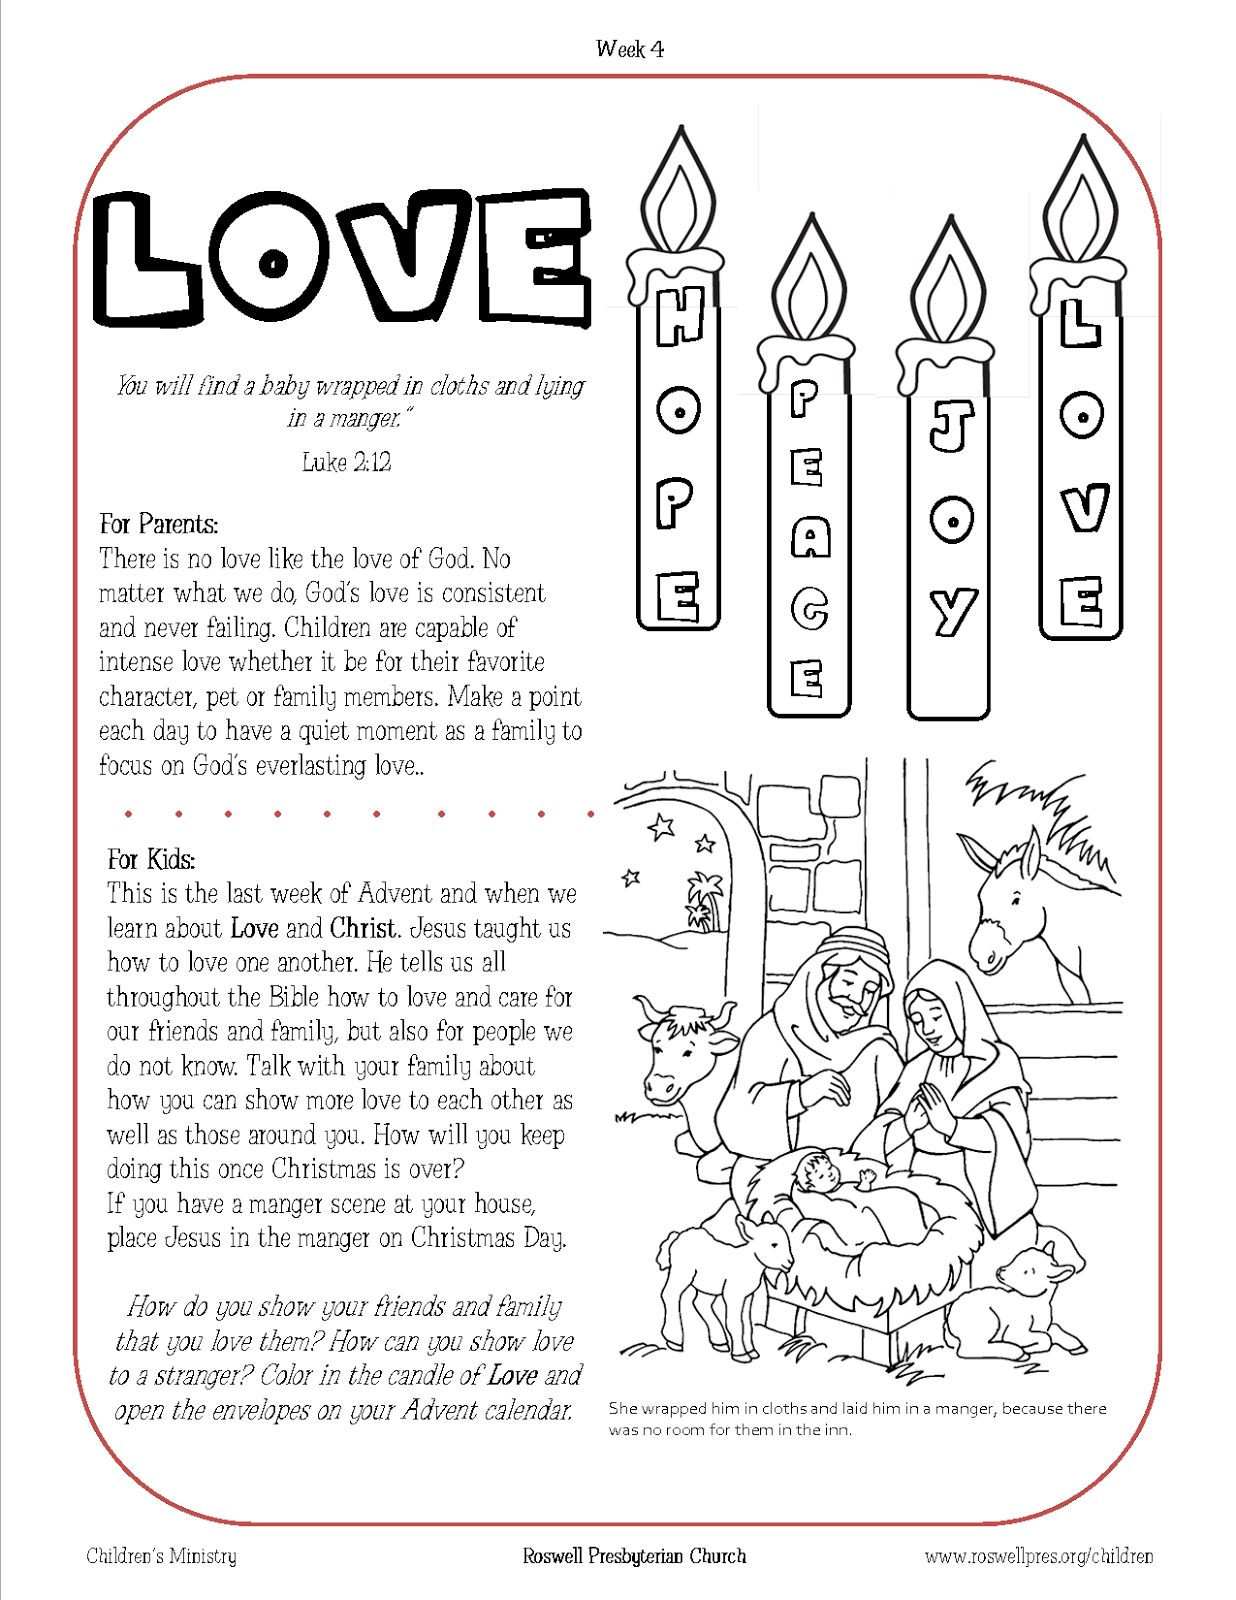 Children's Ministry: Family Advent Devotionals